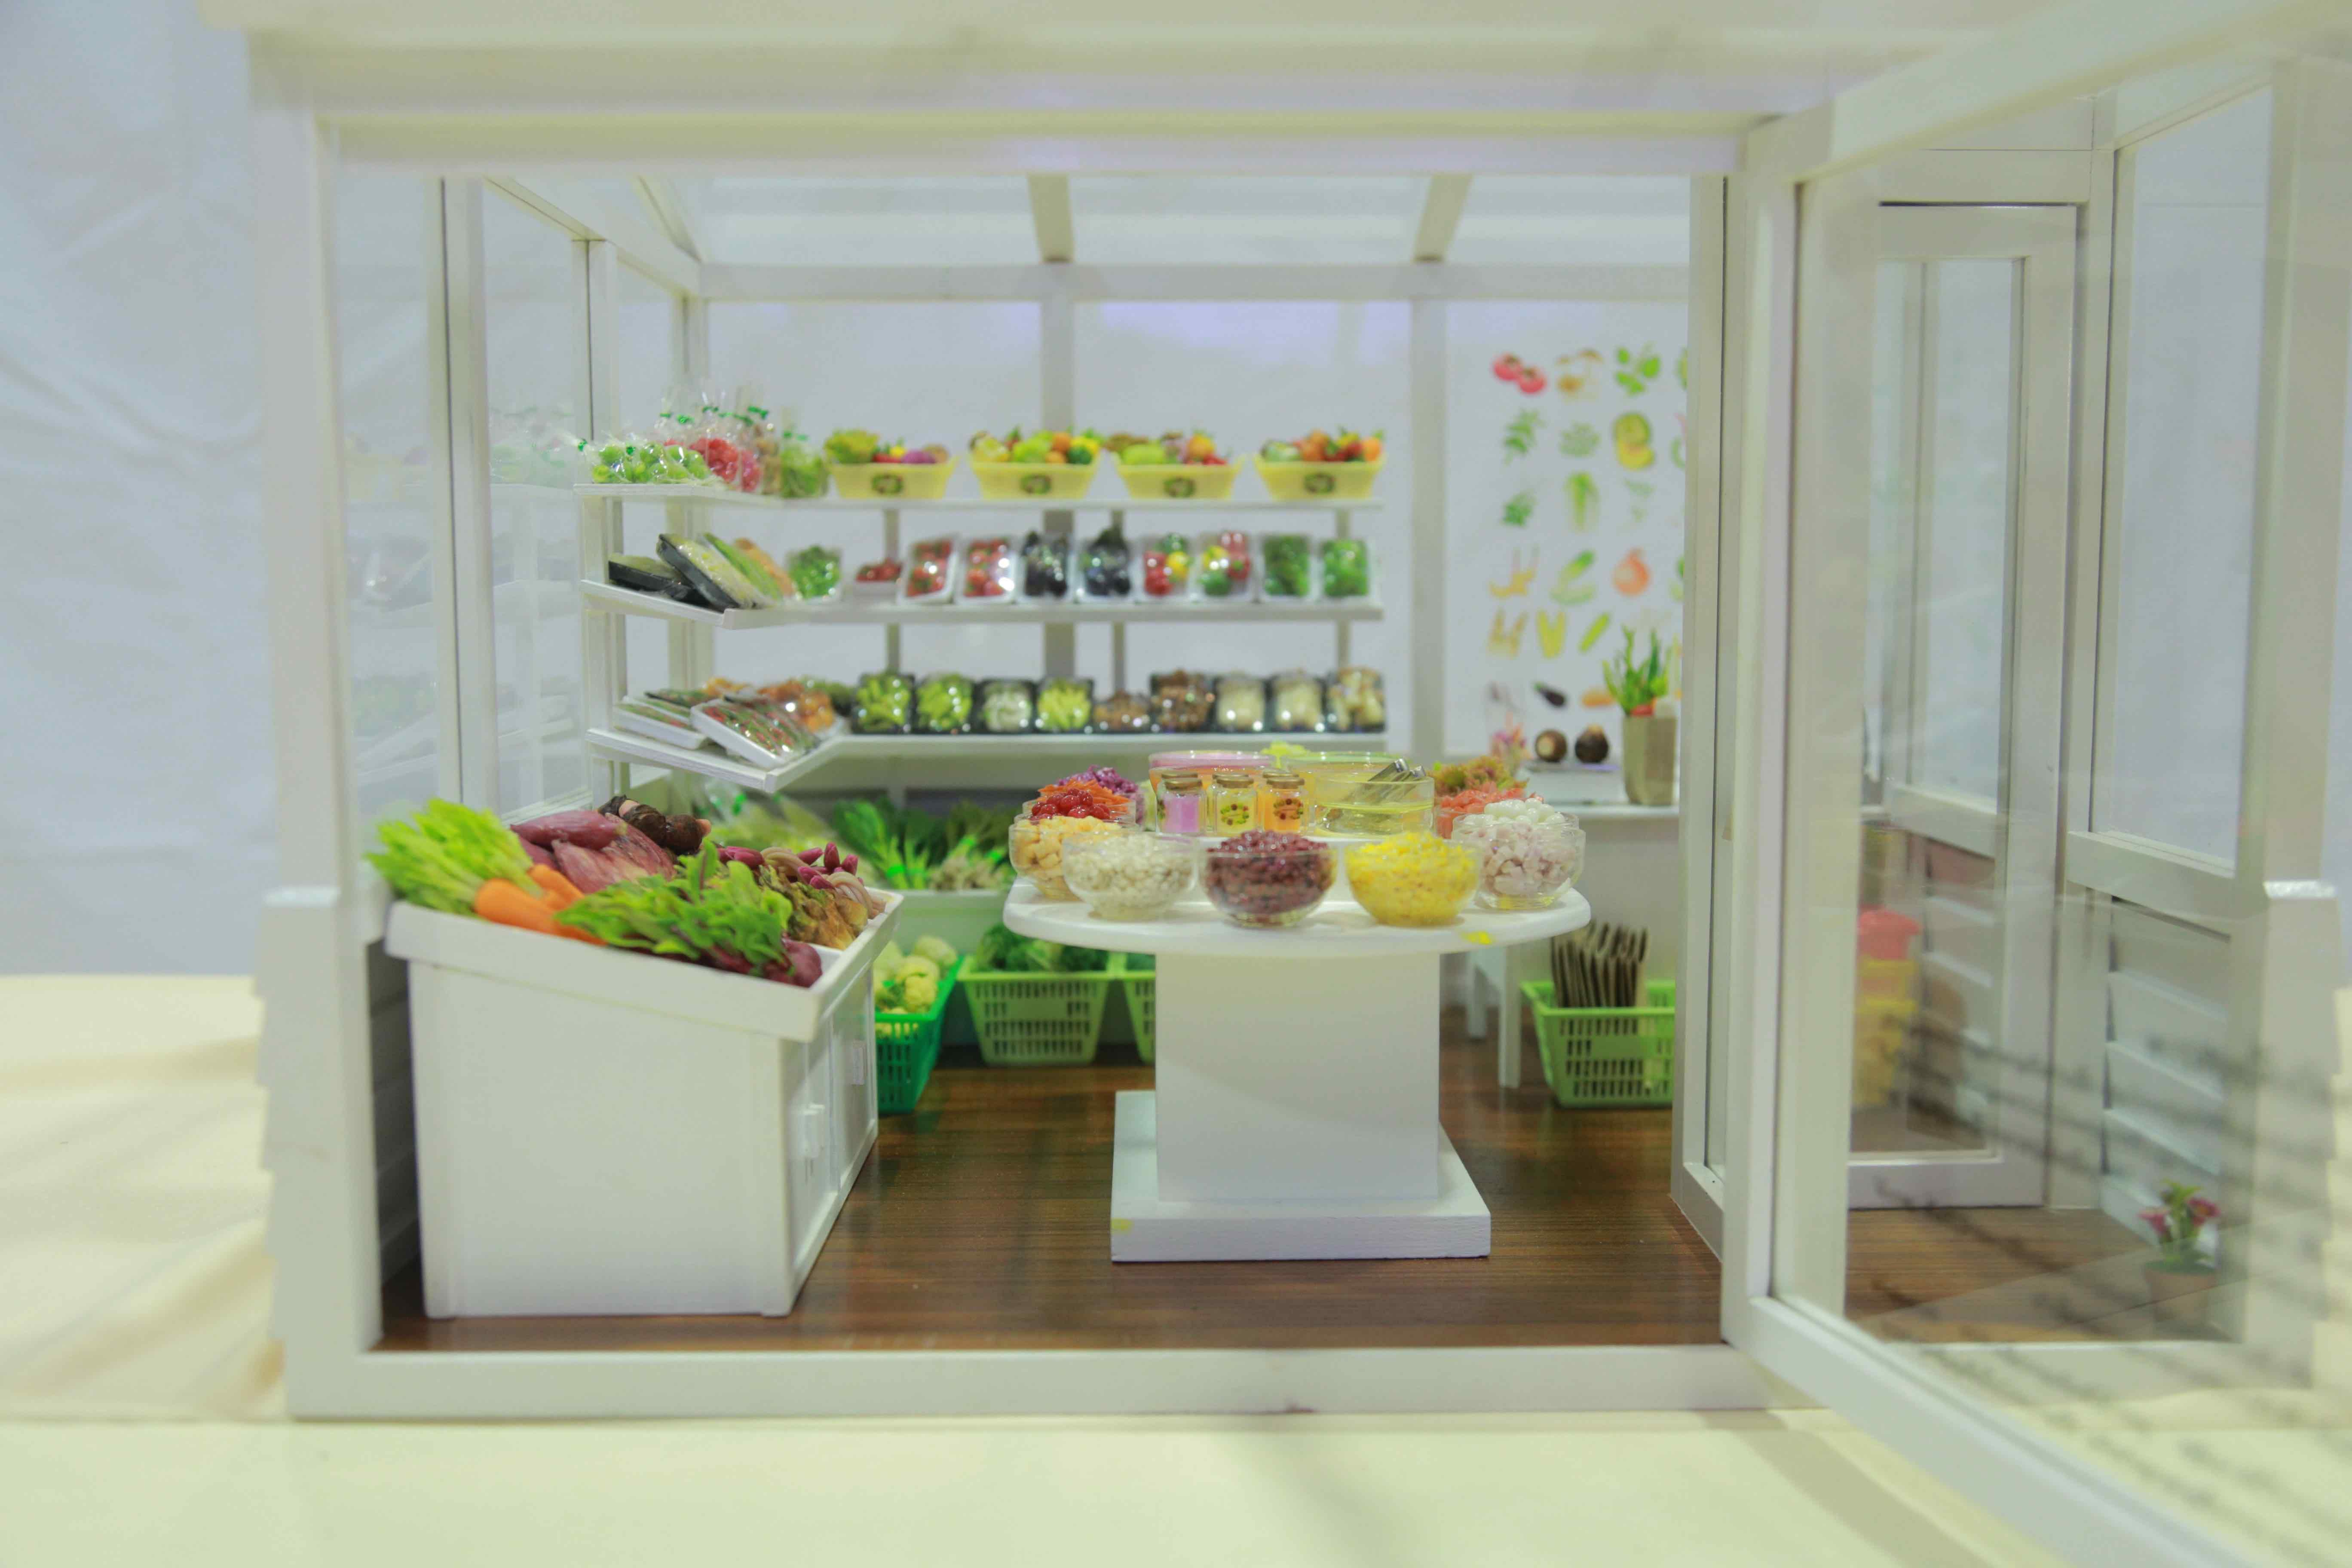 D00098 ร้านผักเพื่อสุขภาพ โลกของจิ๋ว